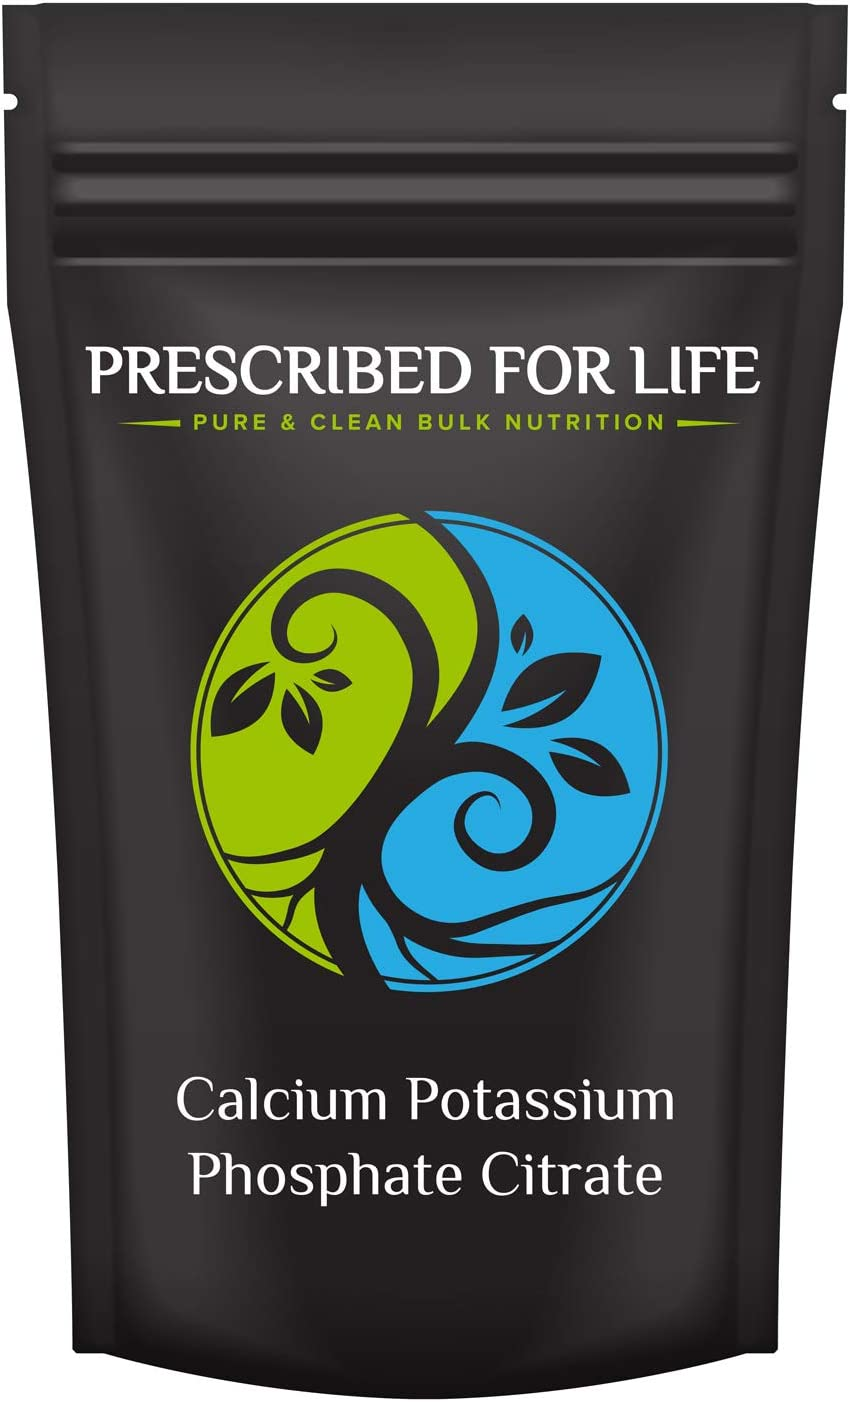 Prescribed for Life Calcium Potassium Phosphate Citrate Powder - 18% Ca / 16% K / 9% P - Calci-K (R) by Albion, 12 oz (340 g)